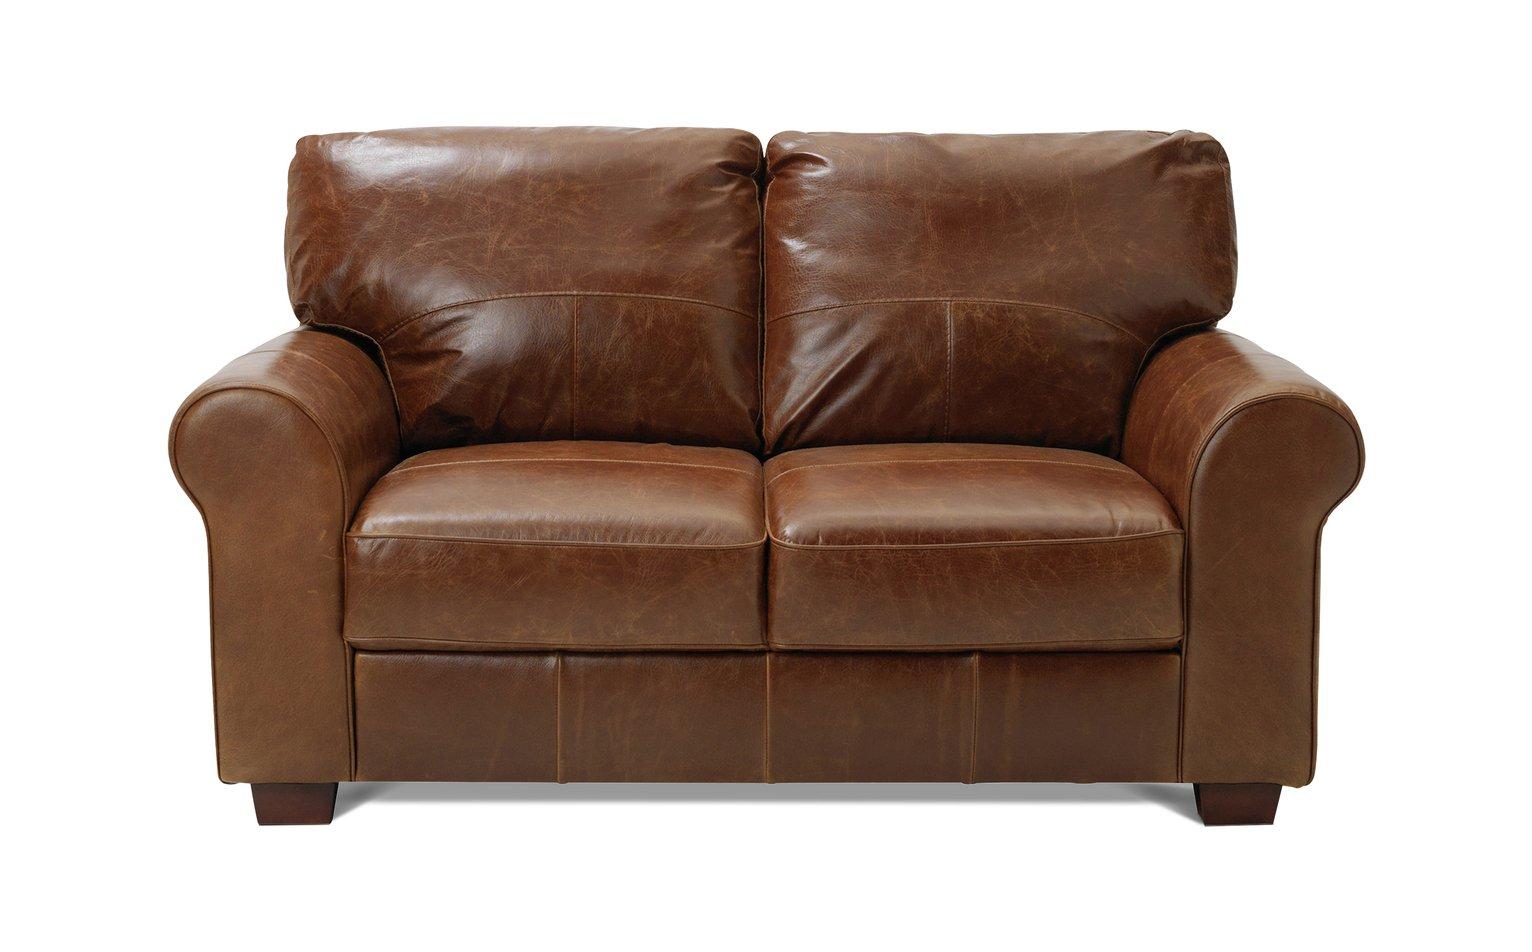 Sale On Heart Of House Salisbury 2 Seater Leather Sofa